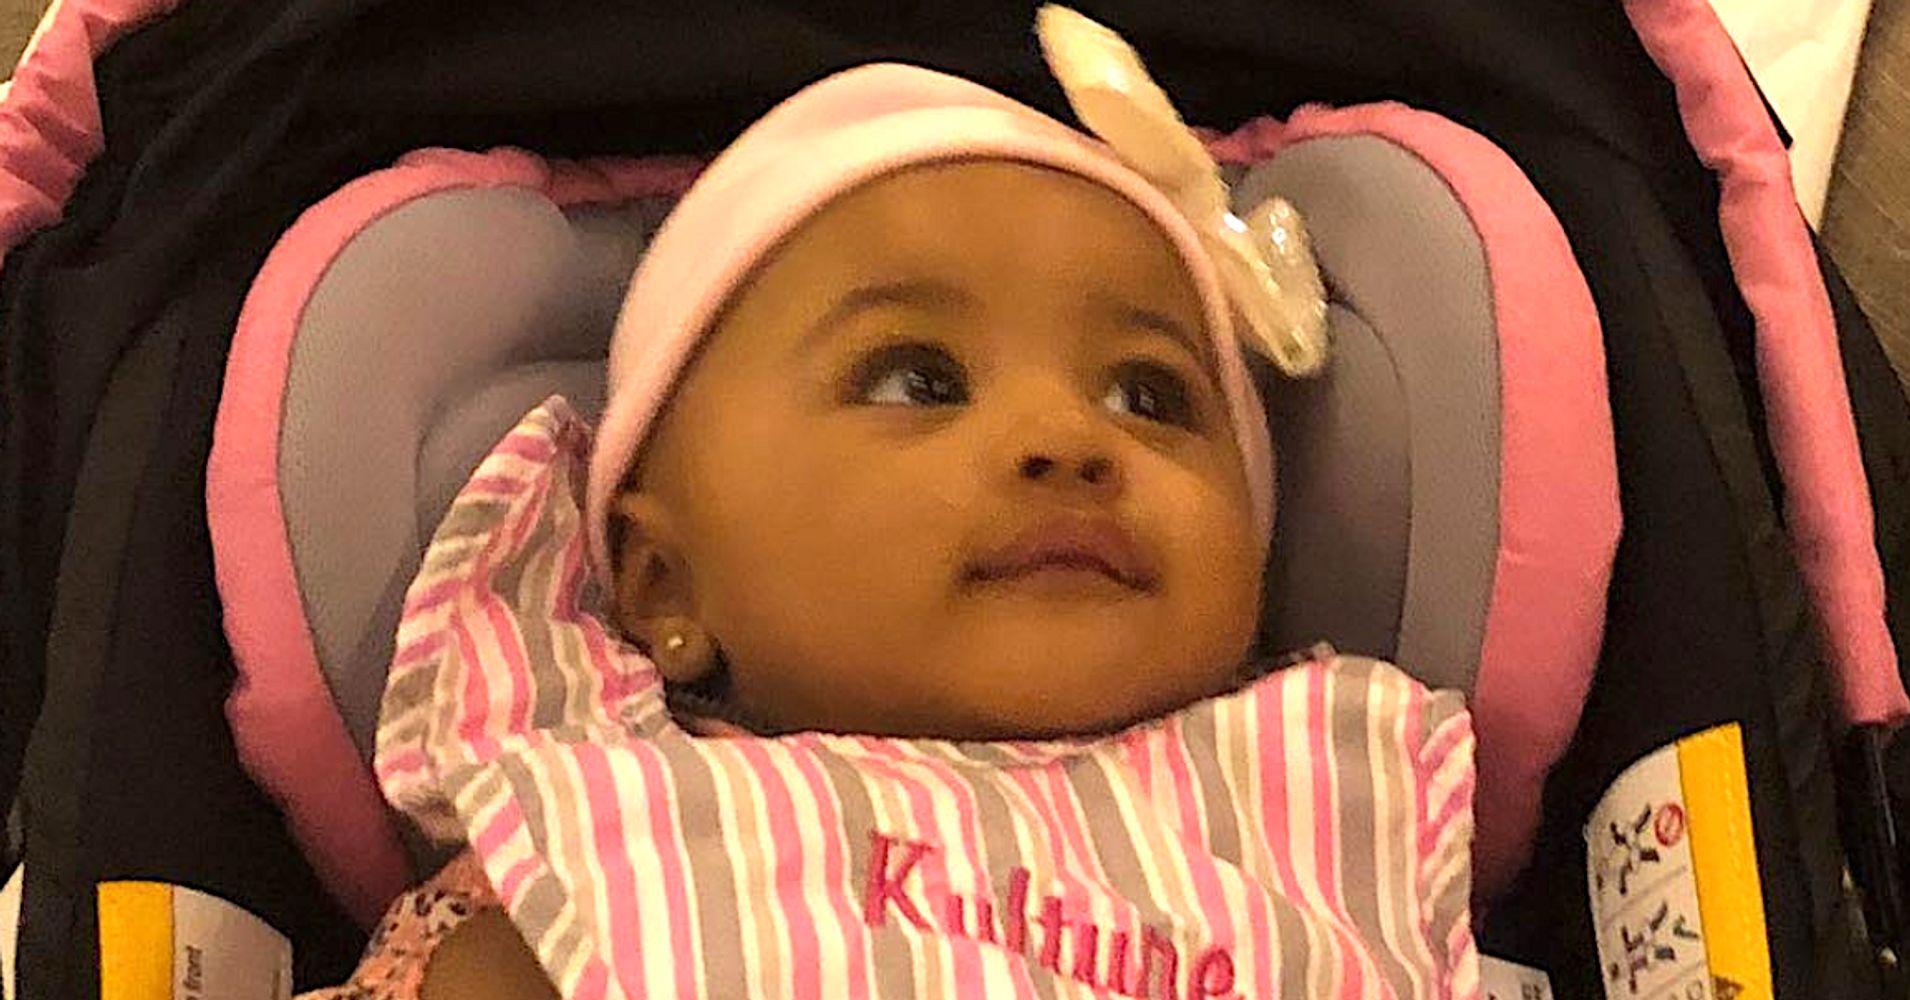 Kulture Cardi B: Cardi B's Baby Repeats 'Mama' But Won't Say 'Papa' To Dad